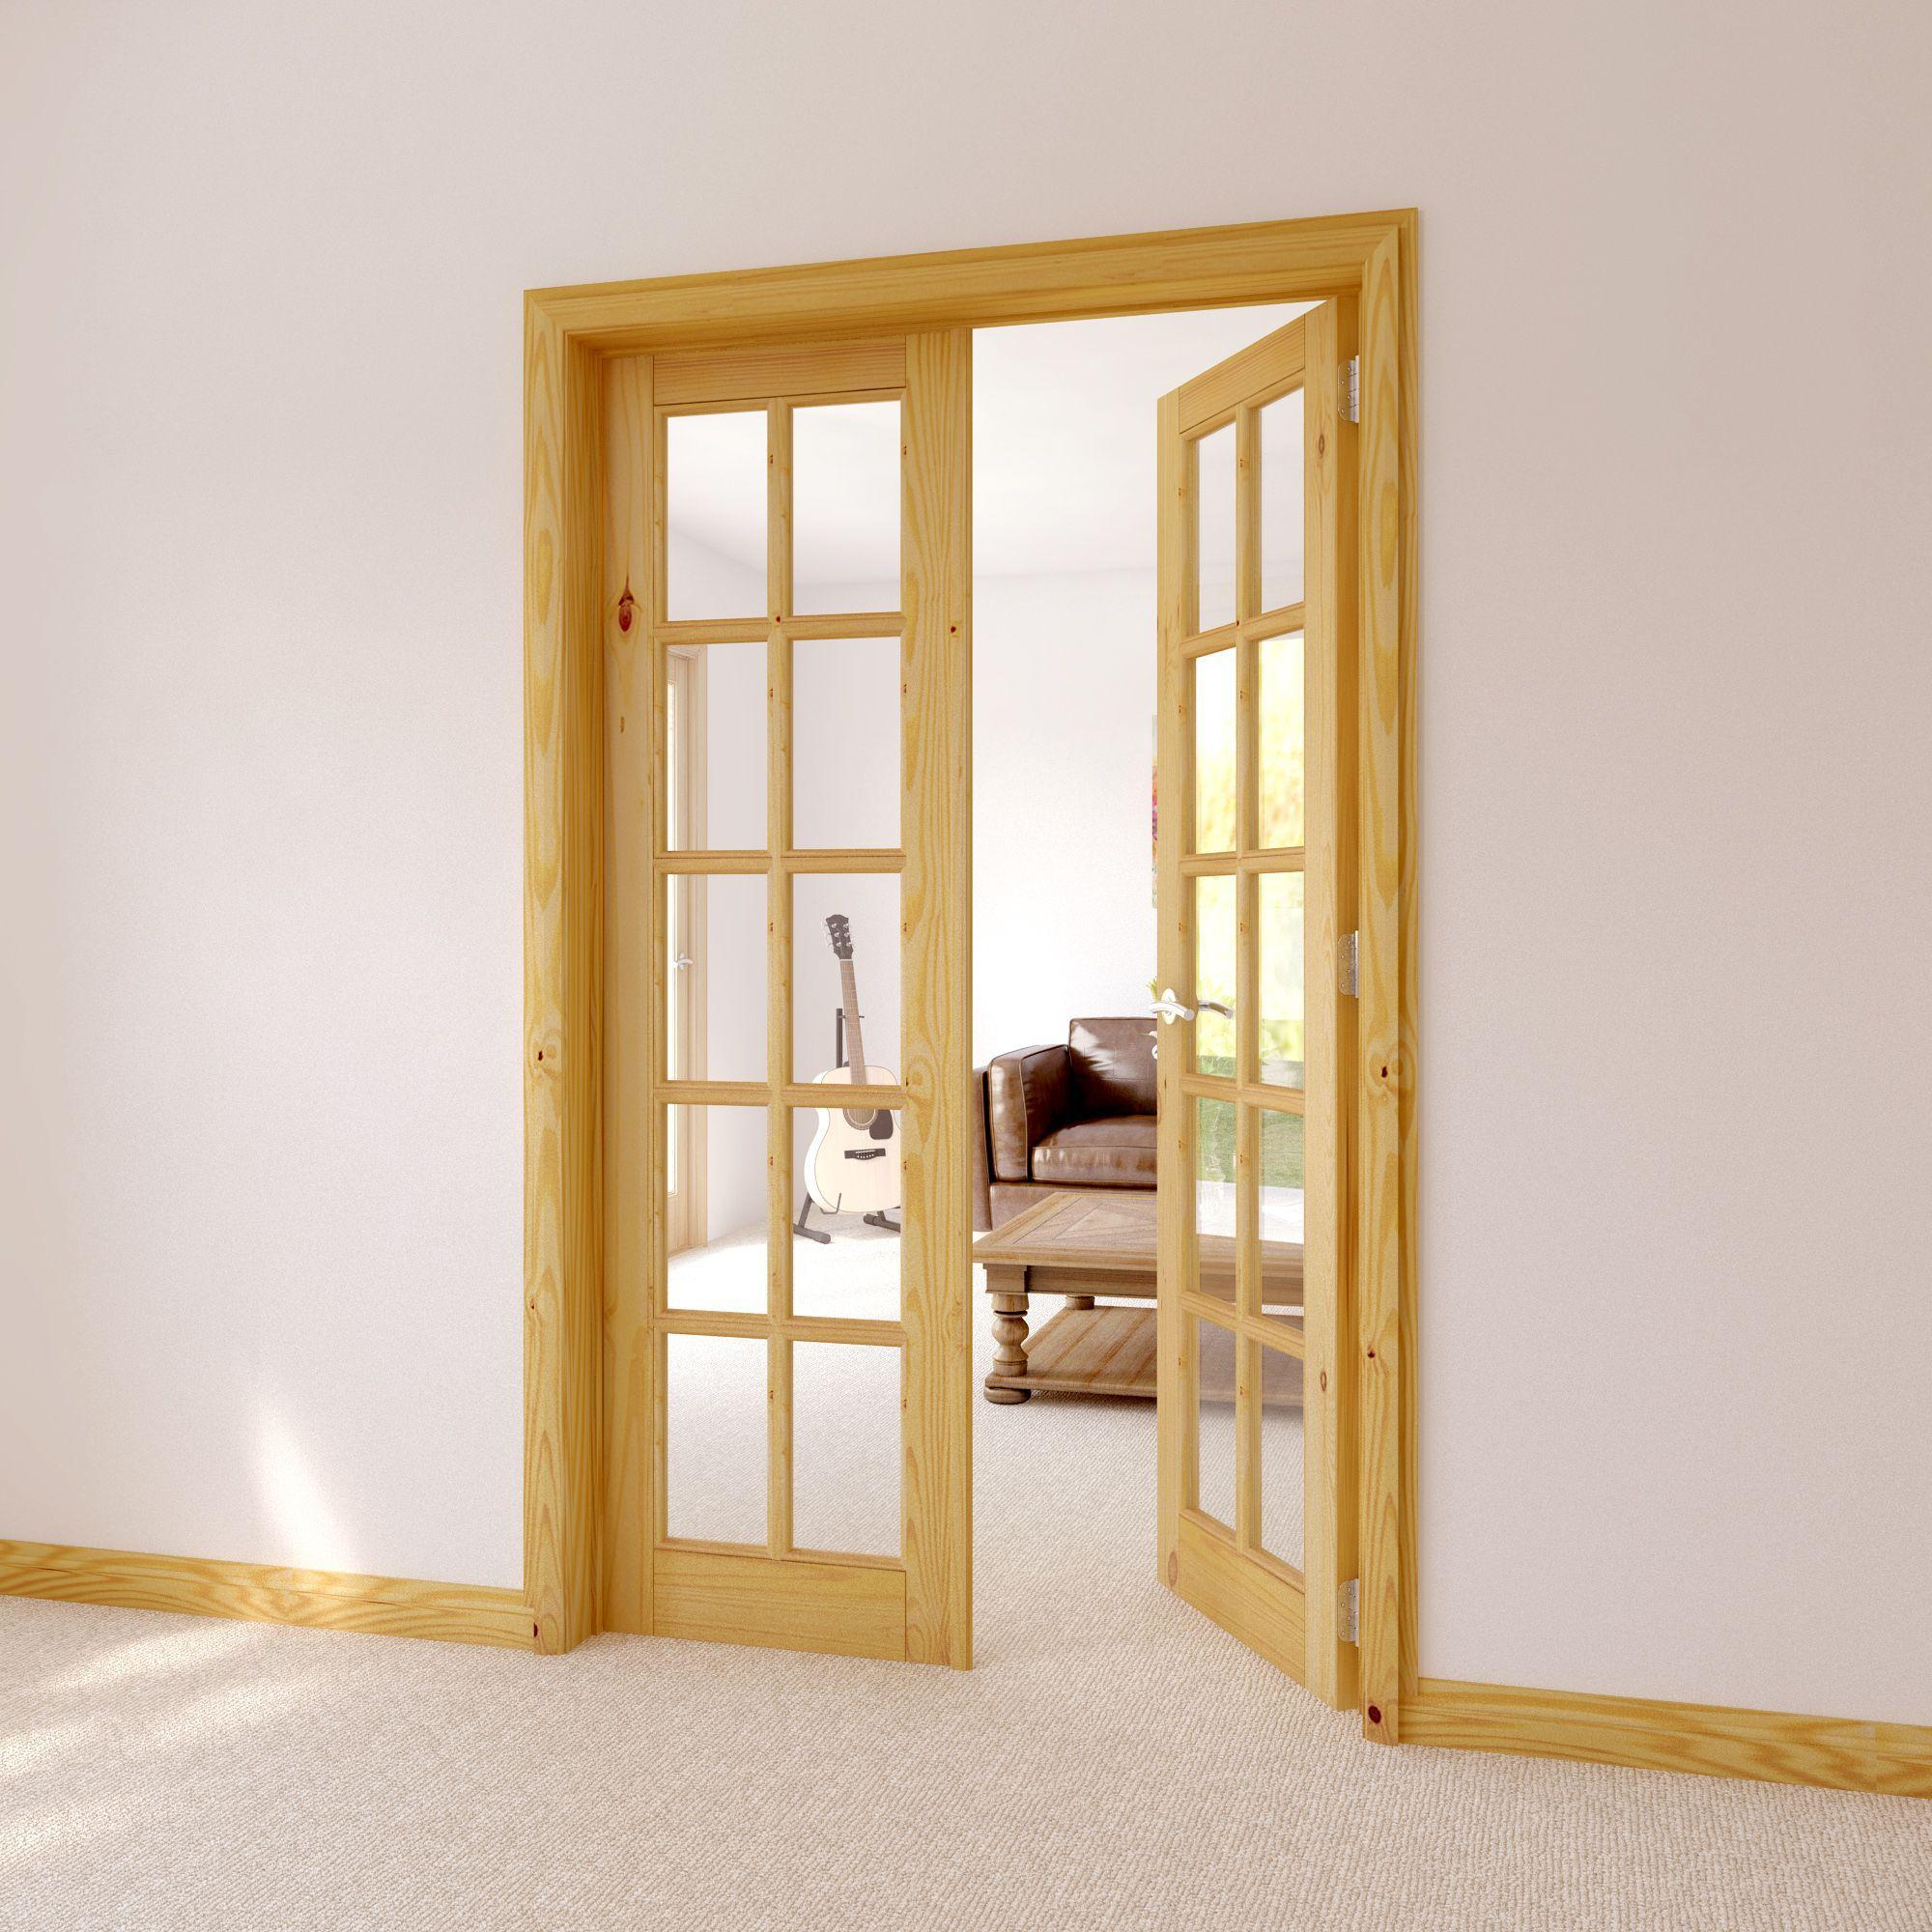 10 Lite Clear Glazed Internal French Door Set, (H)2030mm (W)760mm |  Departments | DIY at B&Q